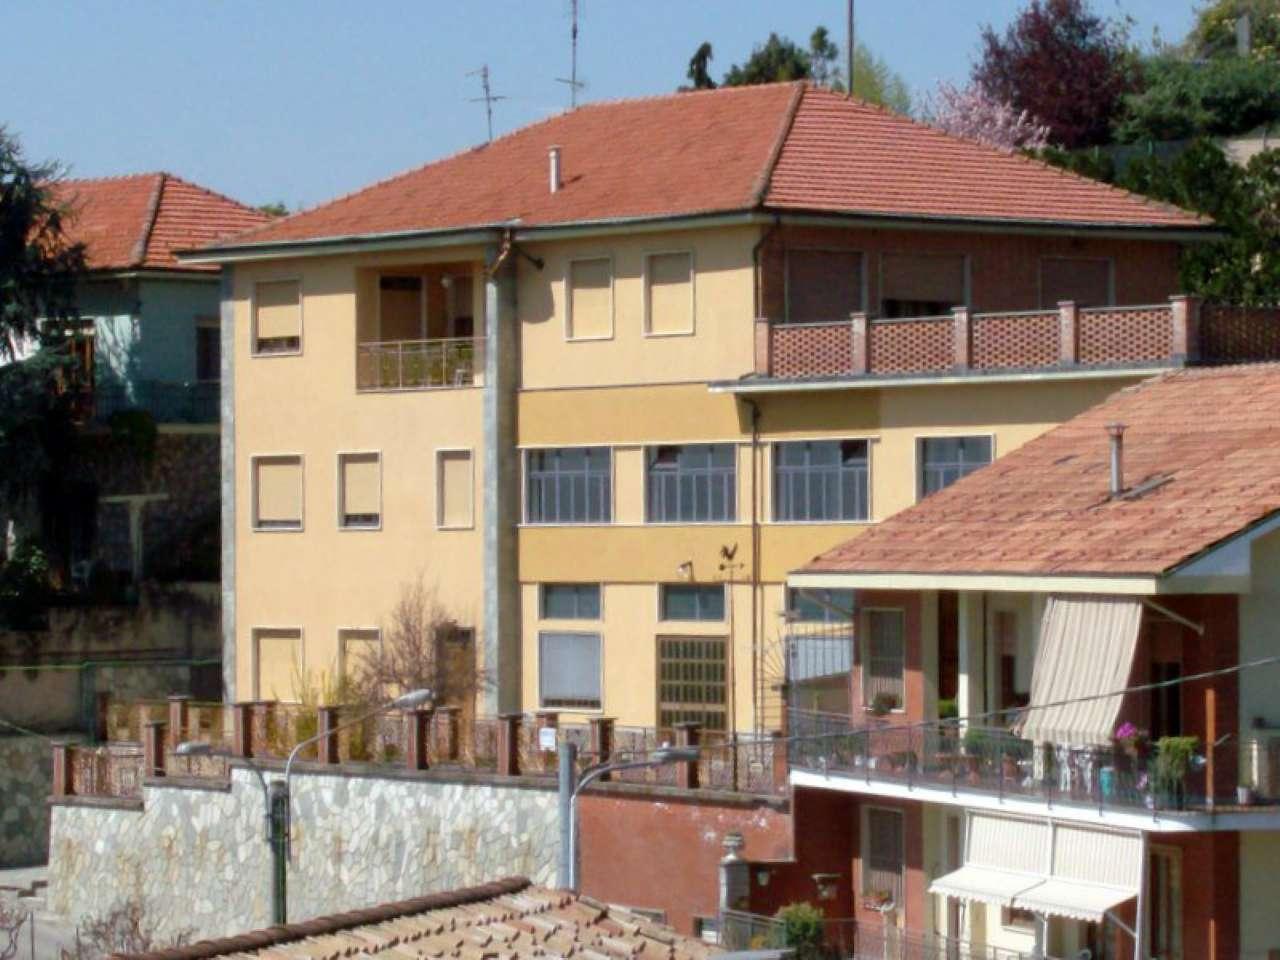 Casa Indipendente in condizioni mediocri in vendita Rif. 5059032